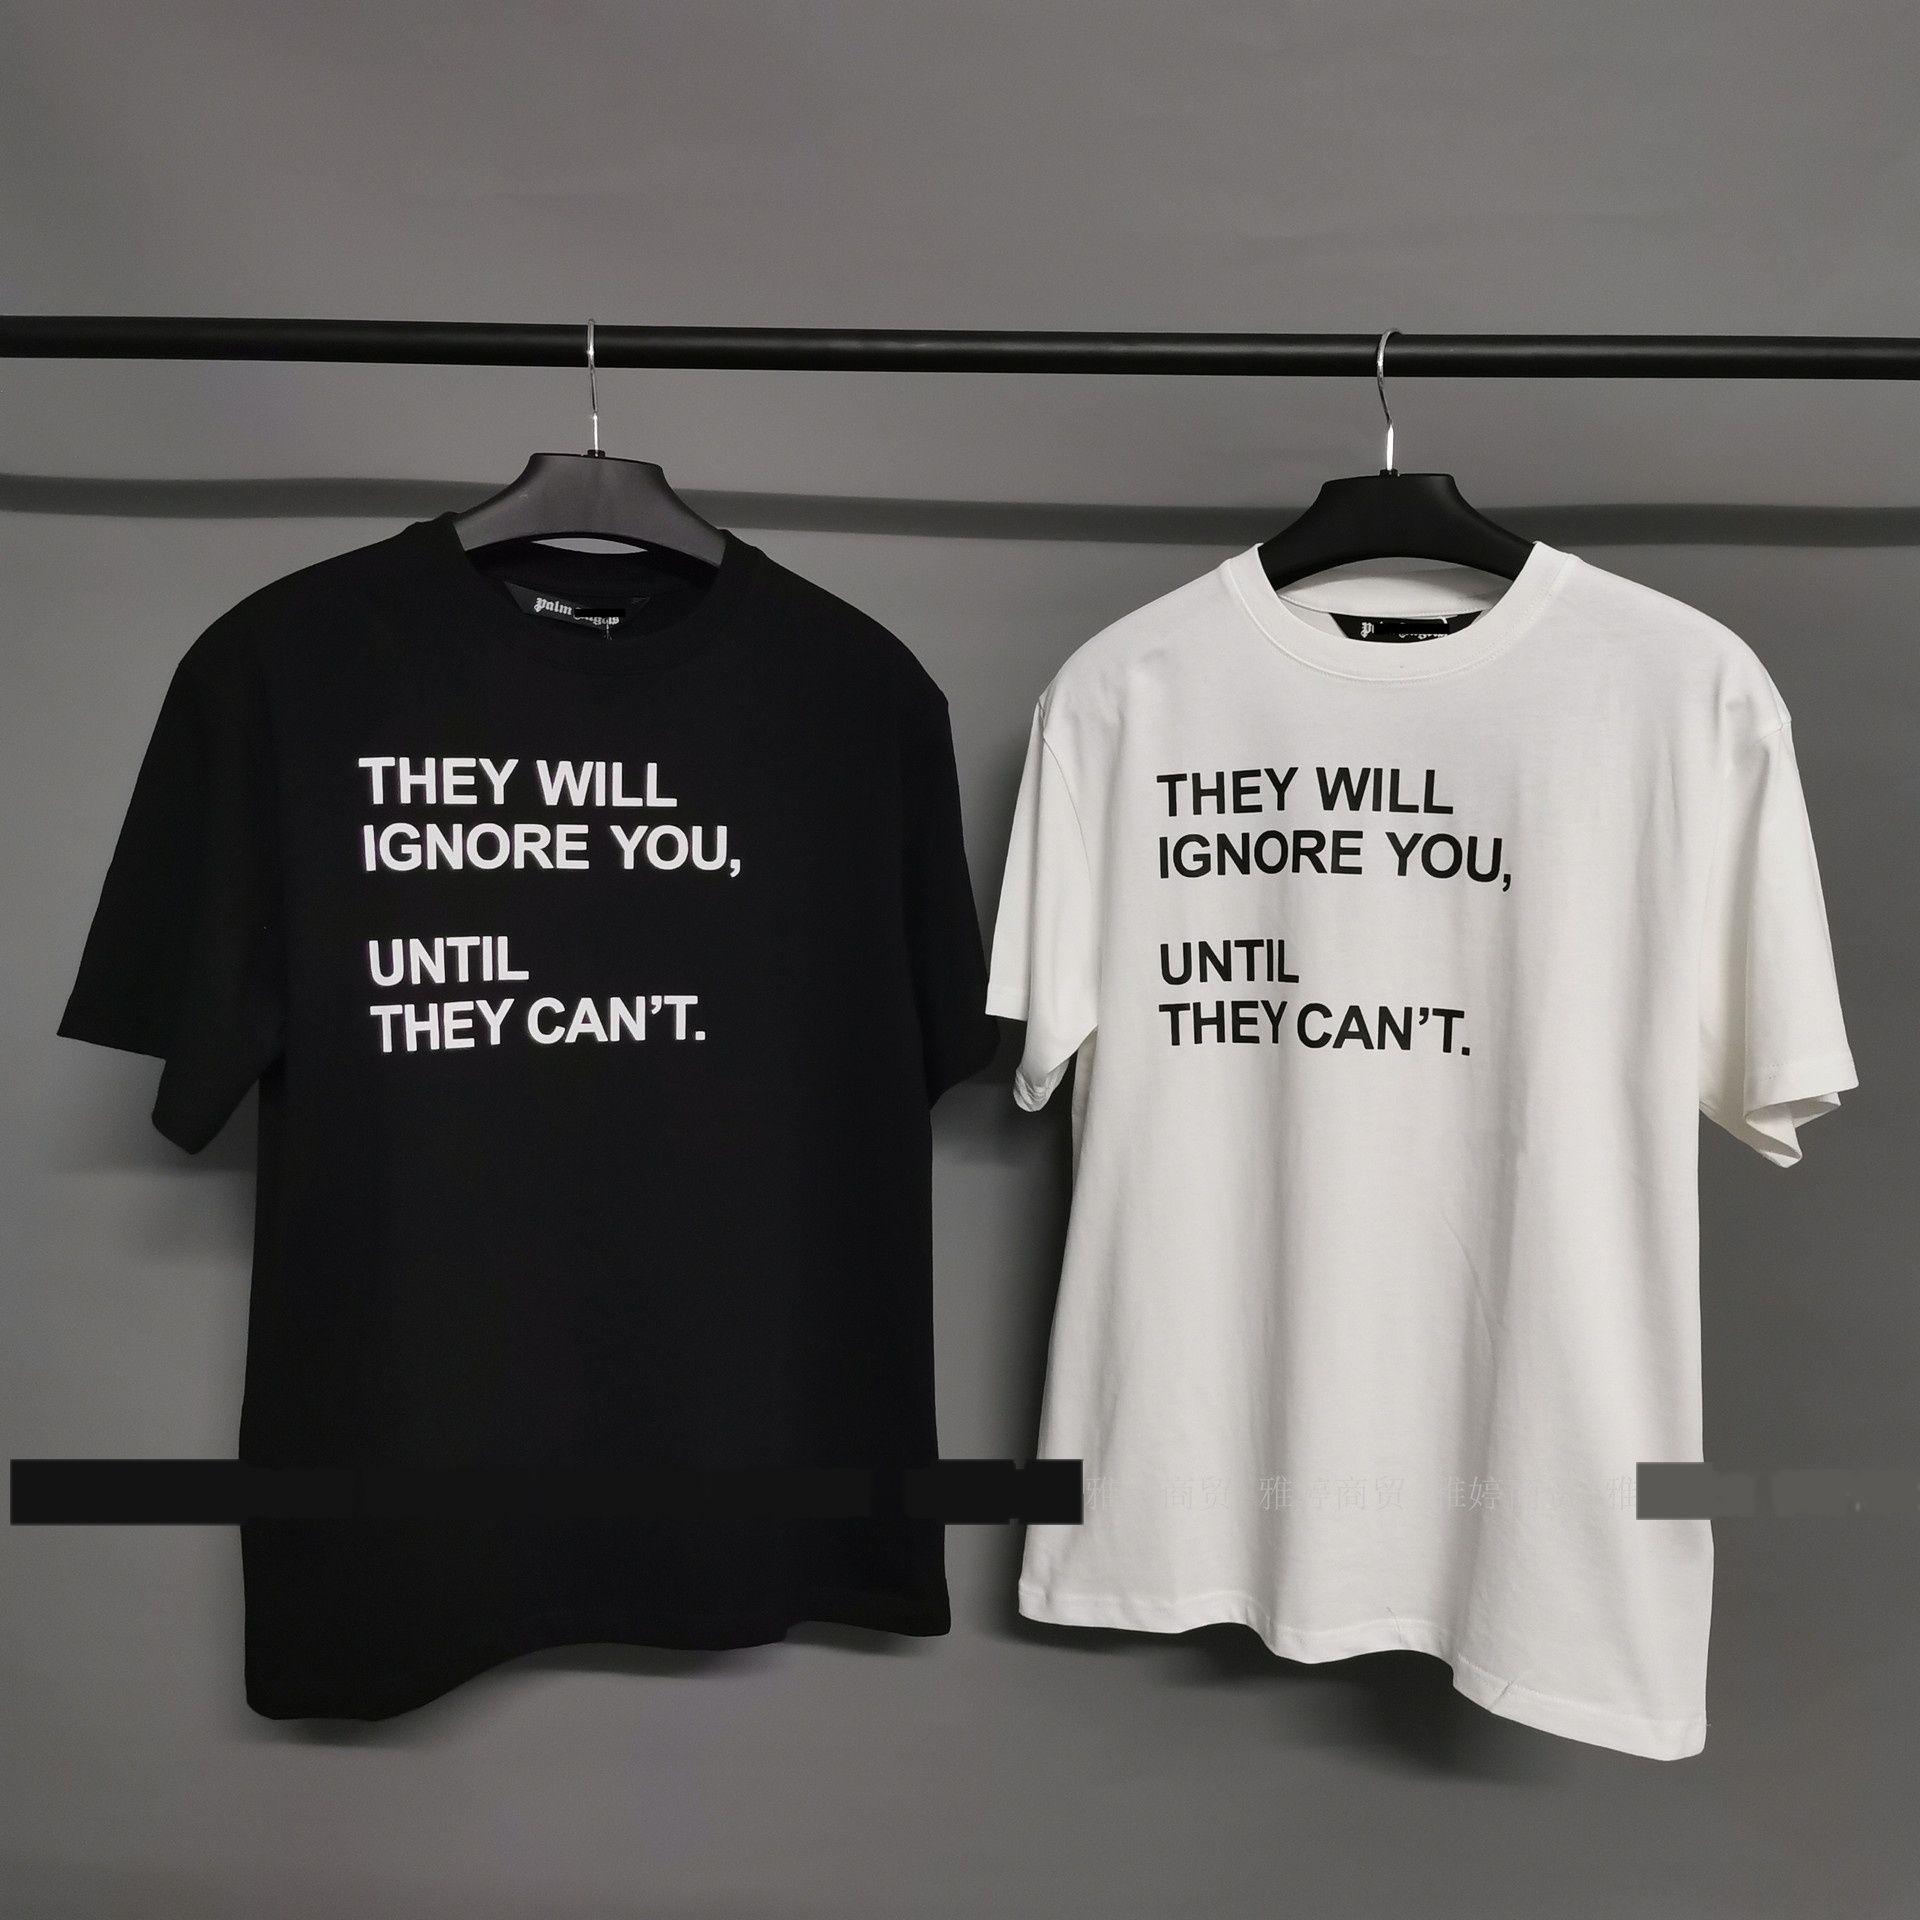 DQRB SHIRTS Moda T Mujeres Nuevo Tipo Impresión para mujer T-shirts Casual Femenino Señoras Sexy camisetas Tops Tees 2019 Klw1218 Ropa Mujer